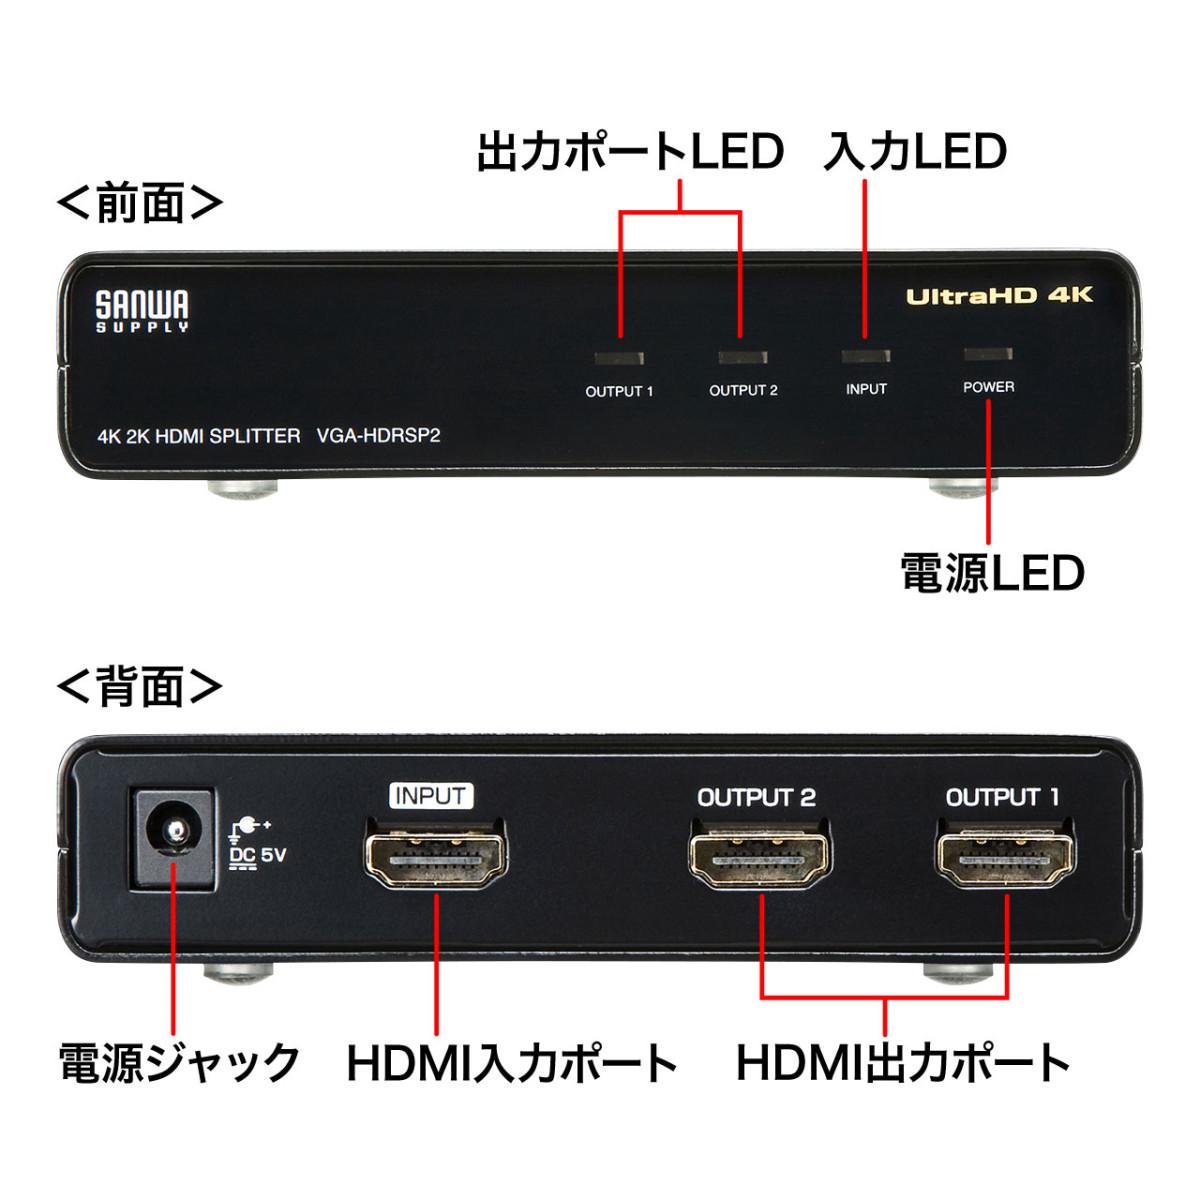 [VGA-HDRSP2] 4K/60Hz・HDR対応HDMI分配器(2分配)